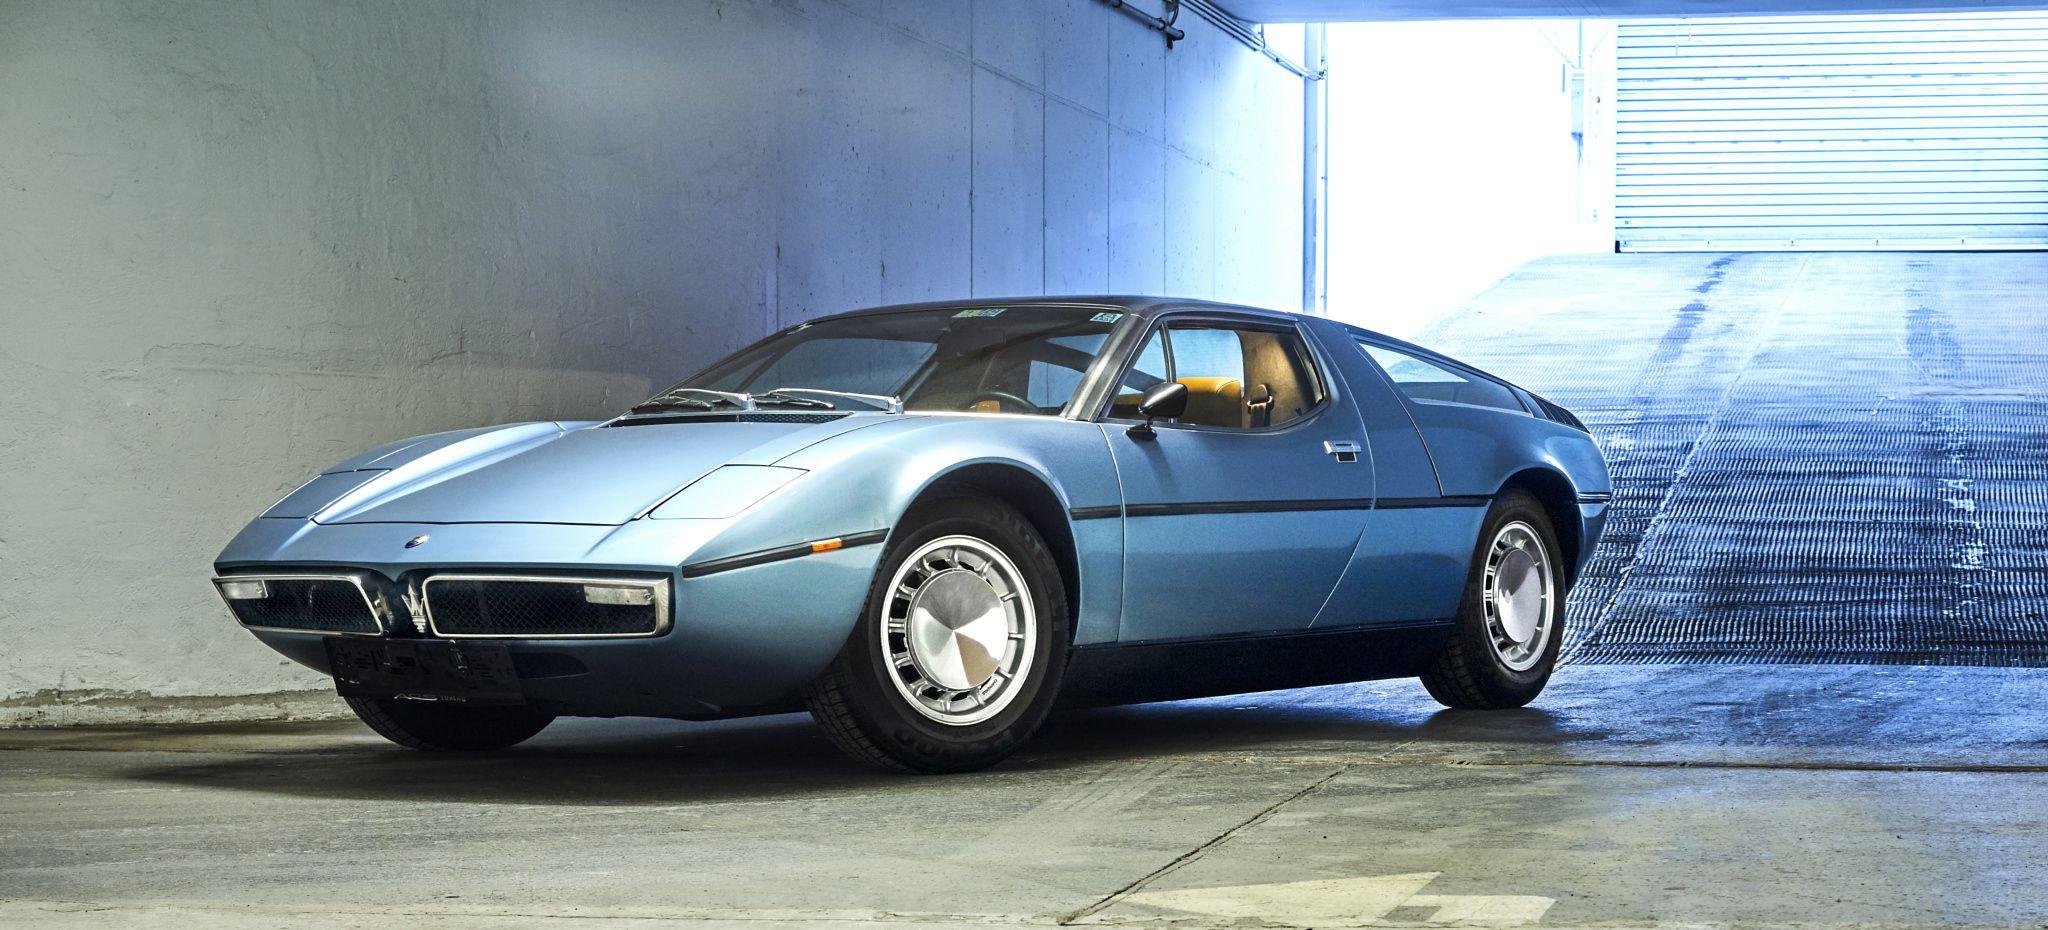 Old Cars And Lots Of Cool Car Stuff | Maserati bora